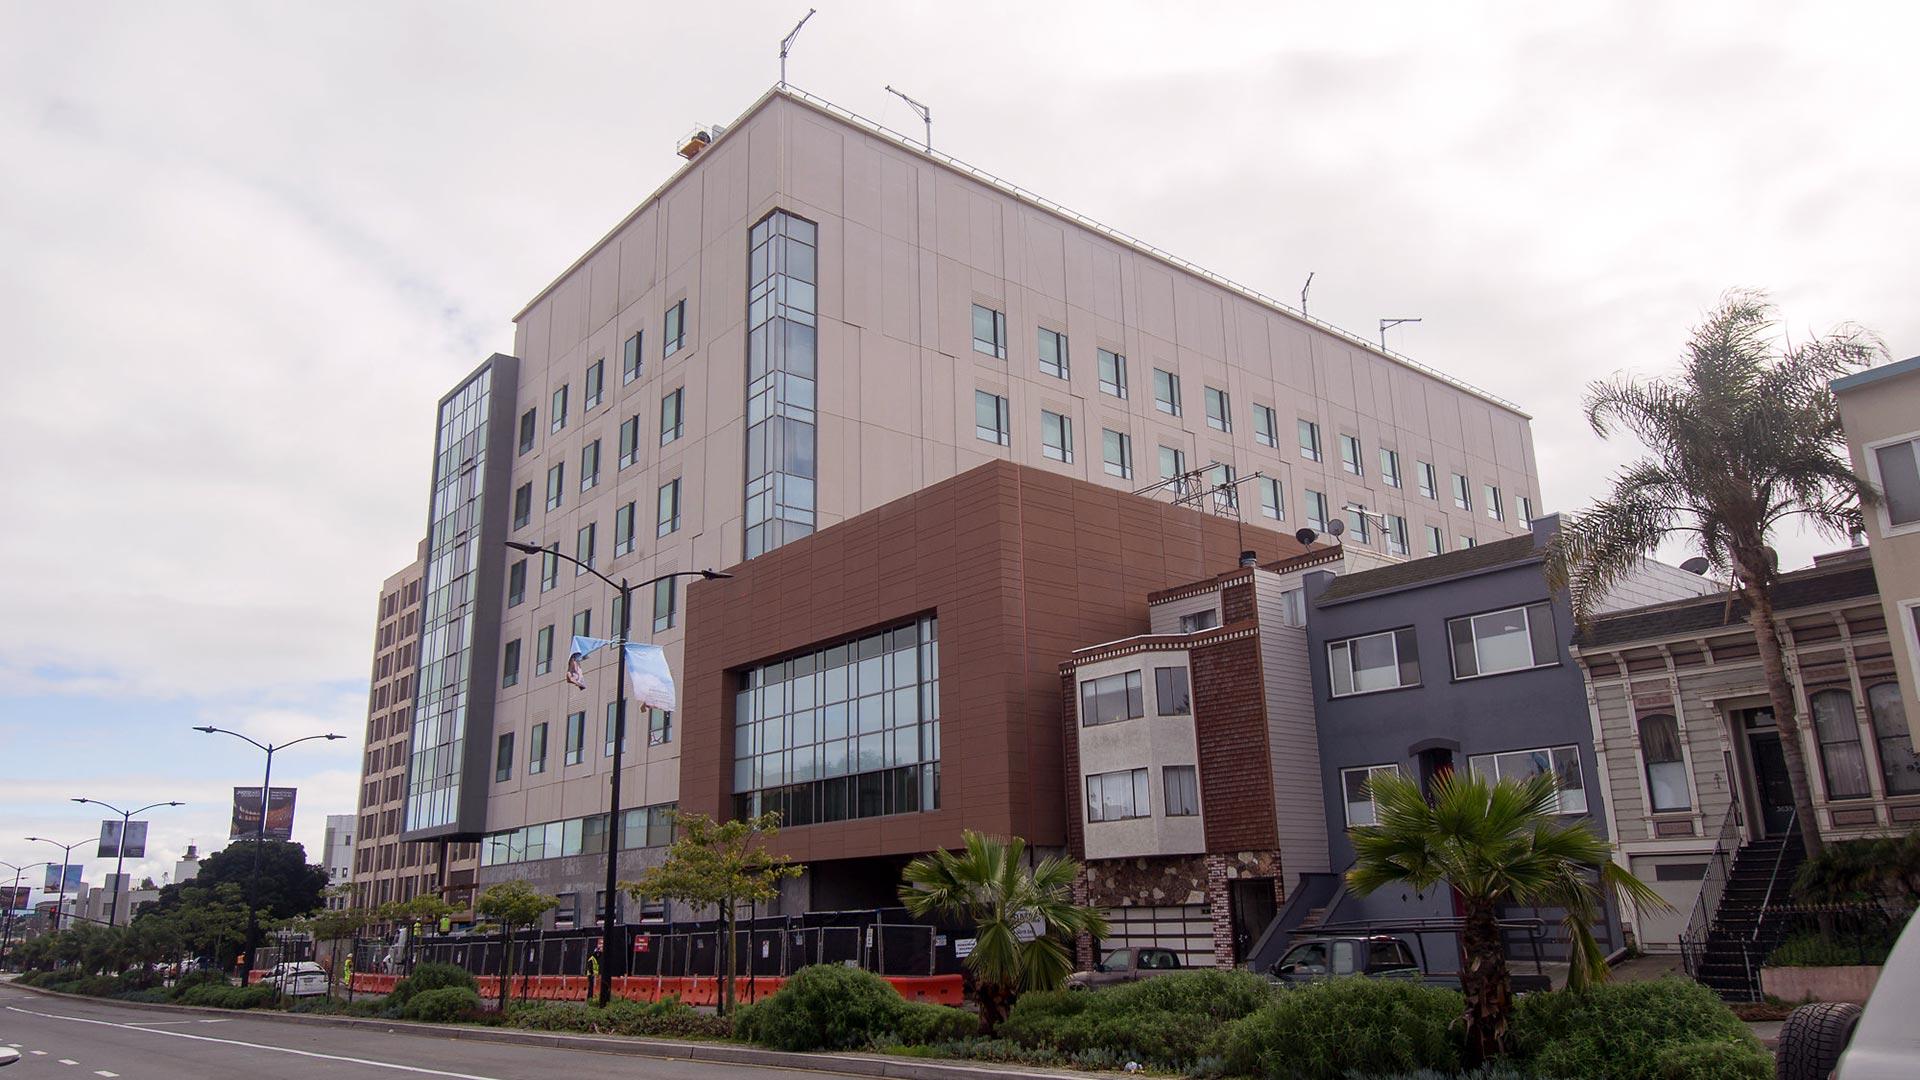 St. Luke's Hospital - San Francisco - street view